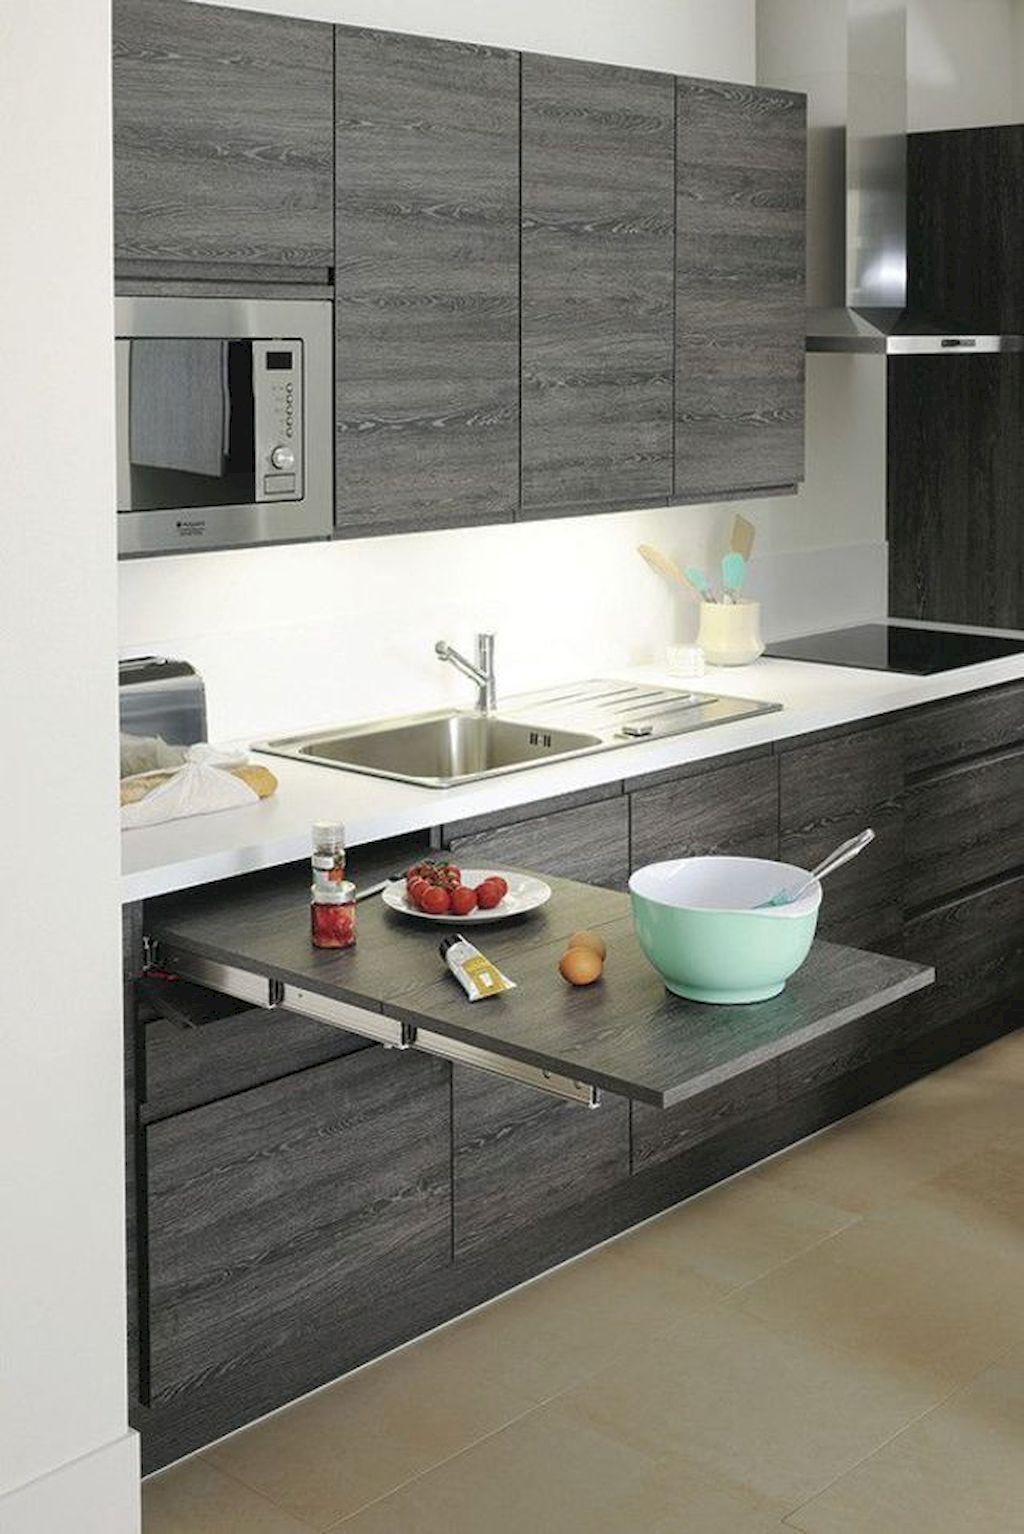 30 Small Kitchen Remodel Ideas